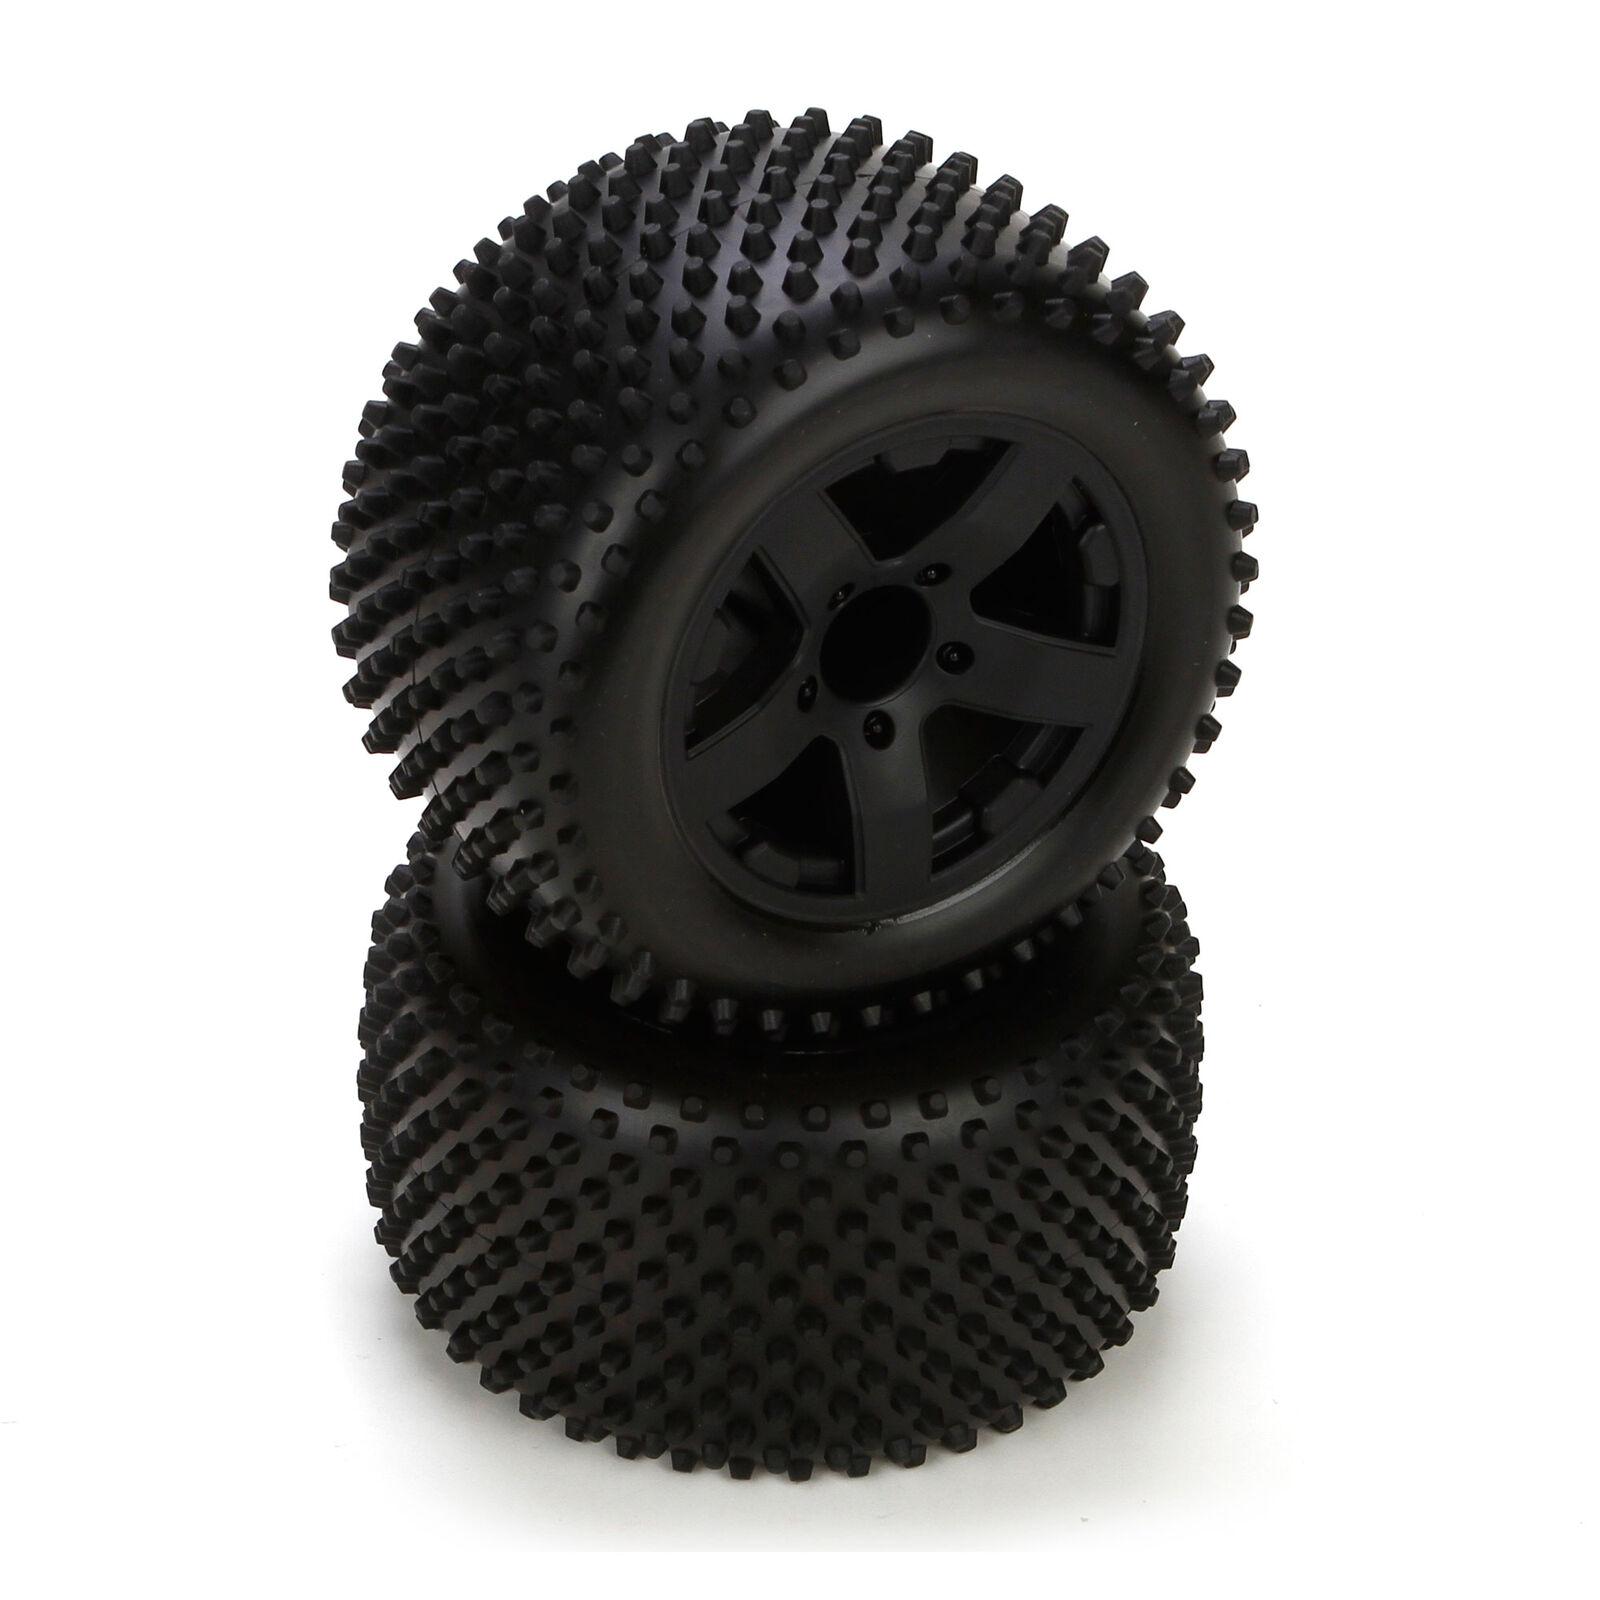 Rear Tire, Premount, Black Wheel (2): 1/10 2WD Circuit